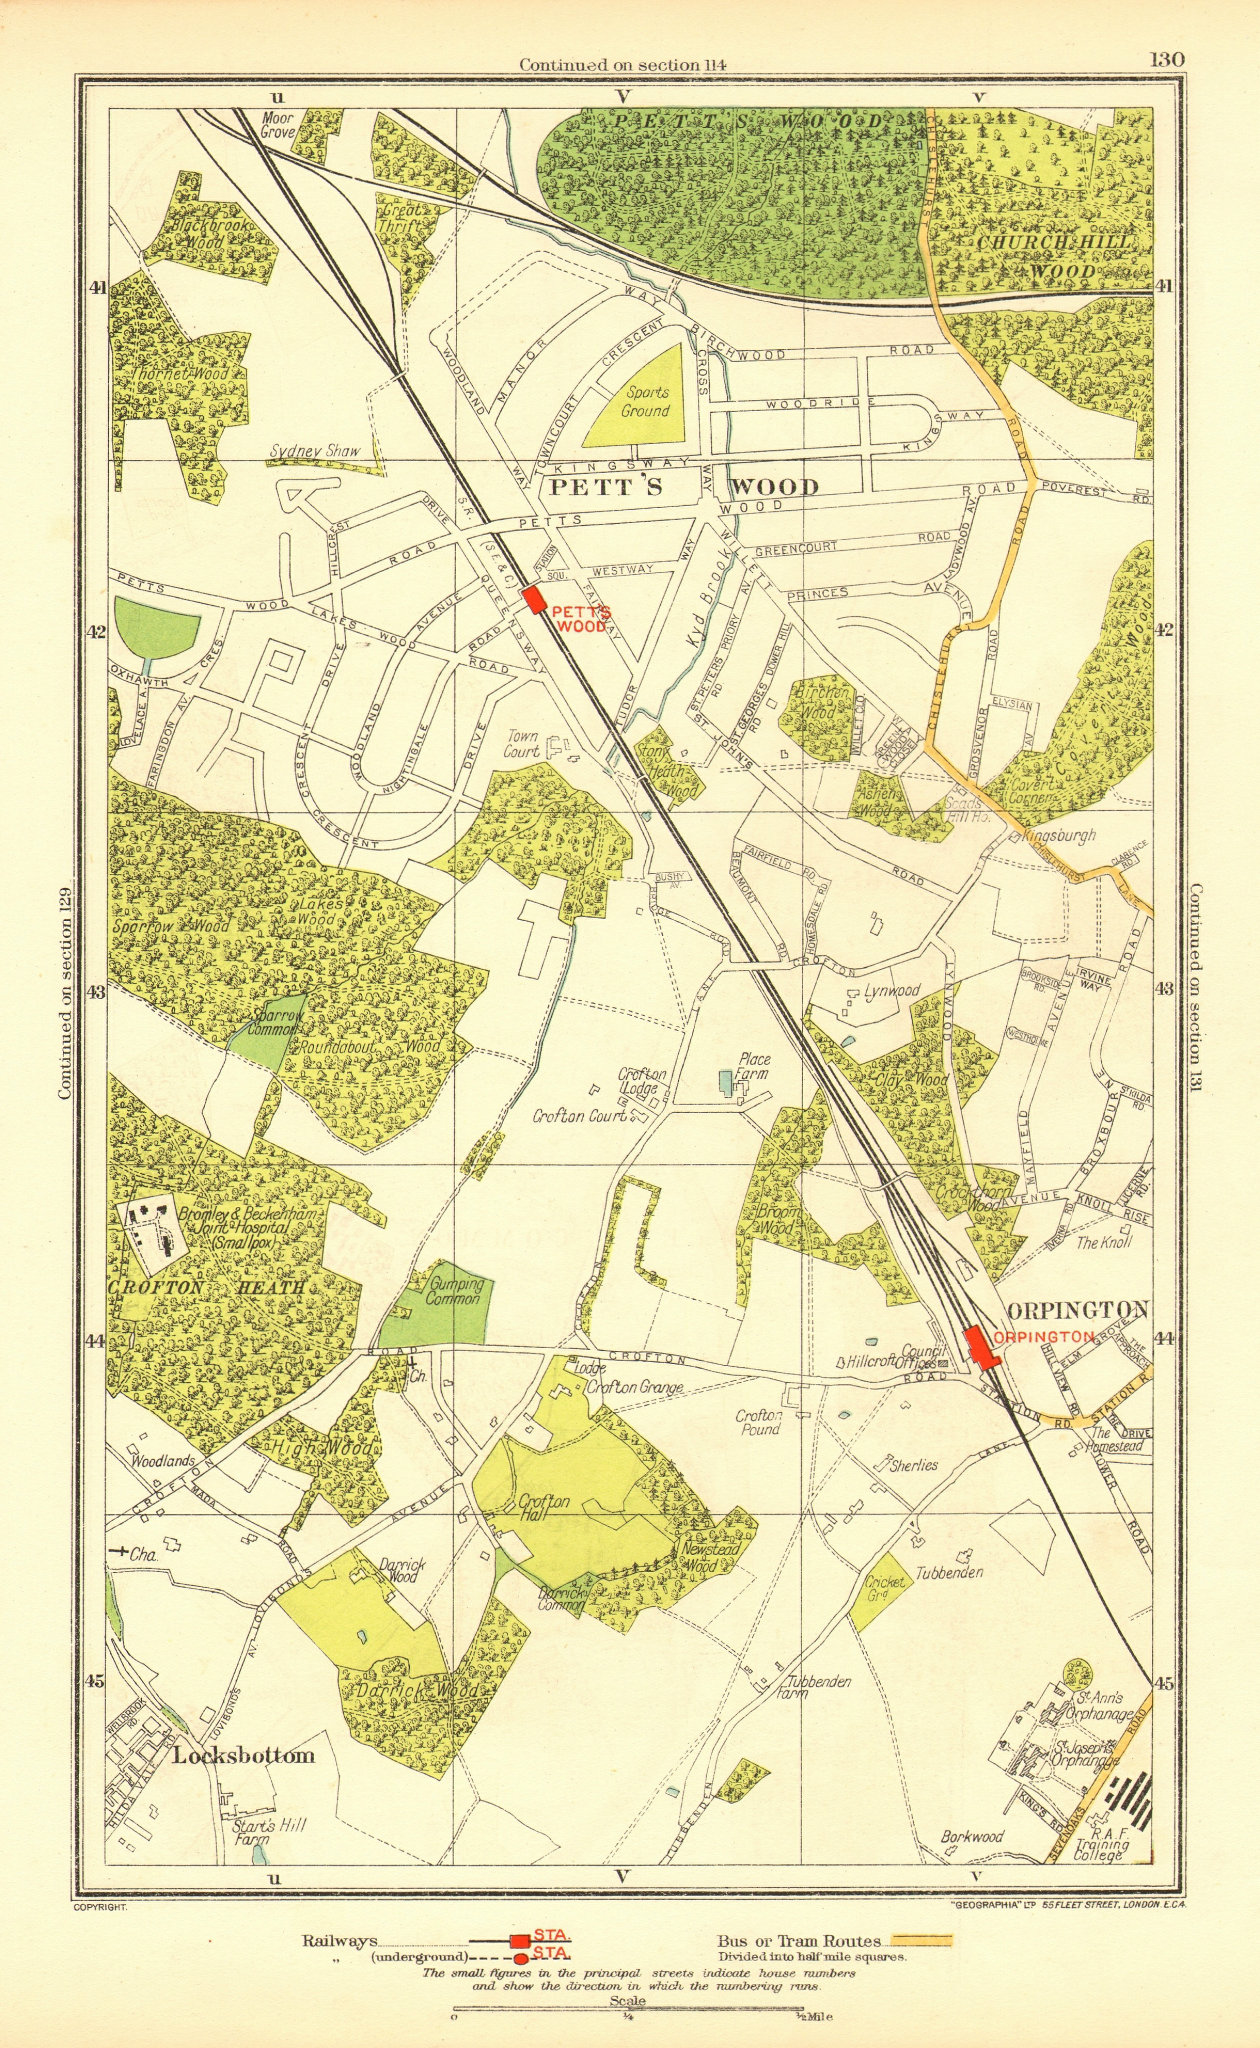 Associate Product PETT'S WOOD. Orpington Locksbottom Crofton Southborough 1937 old vintage map